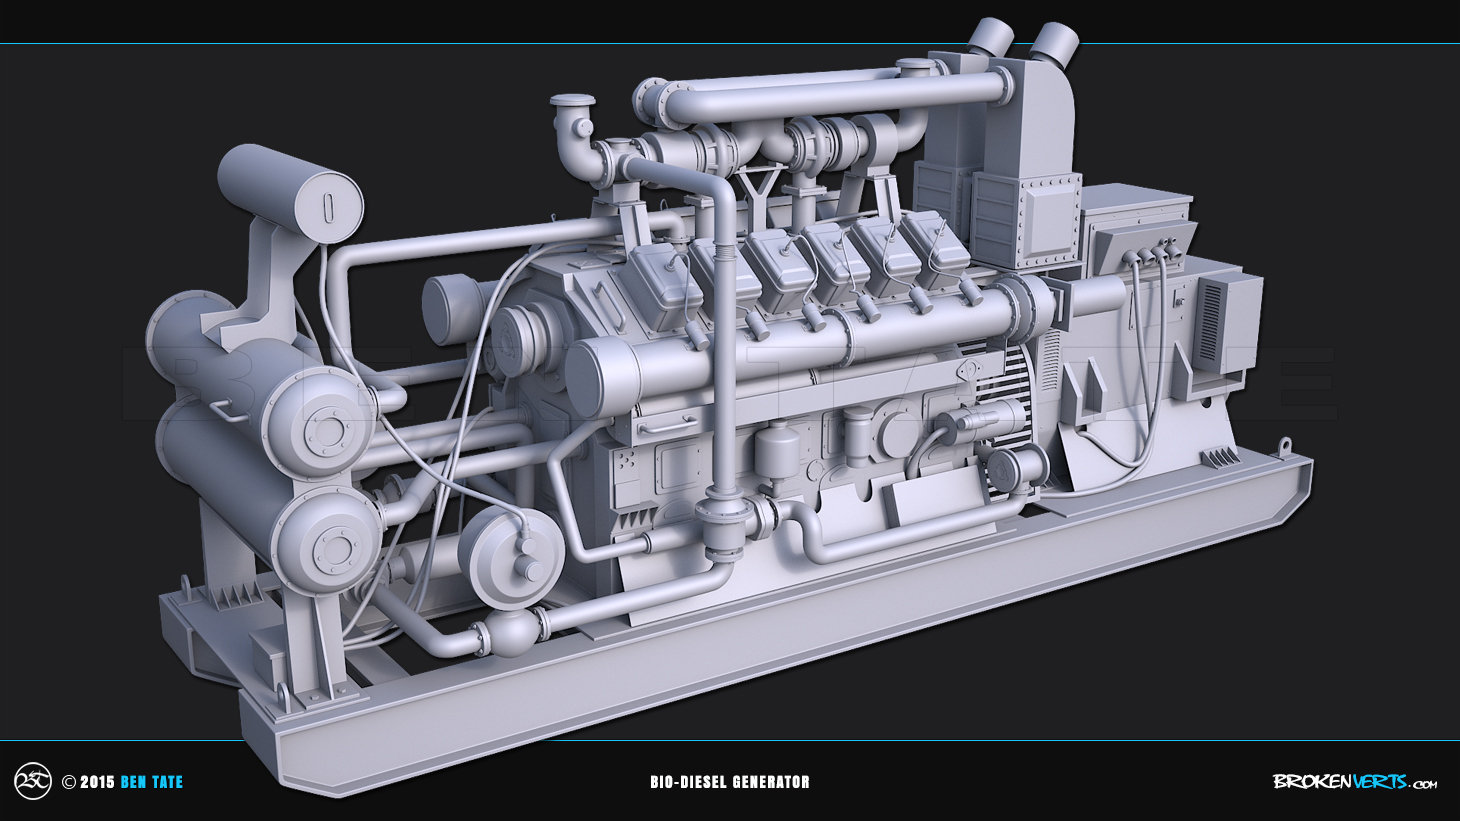 Bio-Diesel Generator 3ds Max Clay Render   AO Render   3D Model   Ben Tate   3ds Max V-Ray